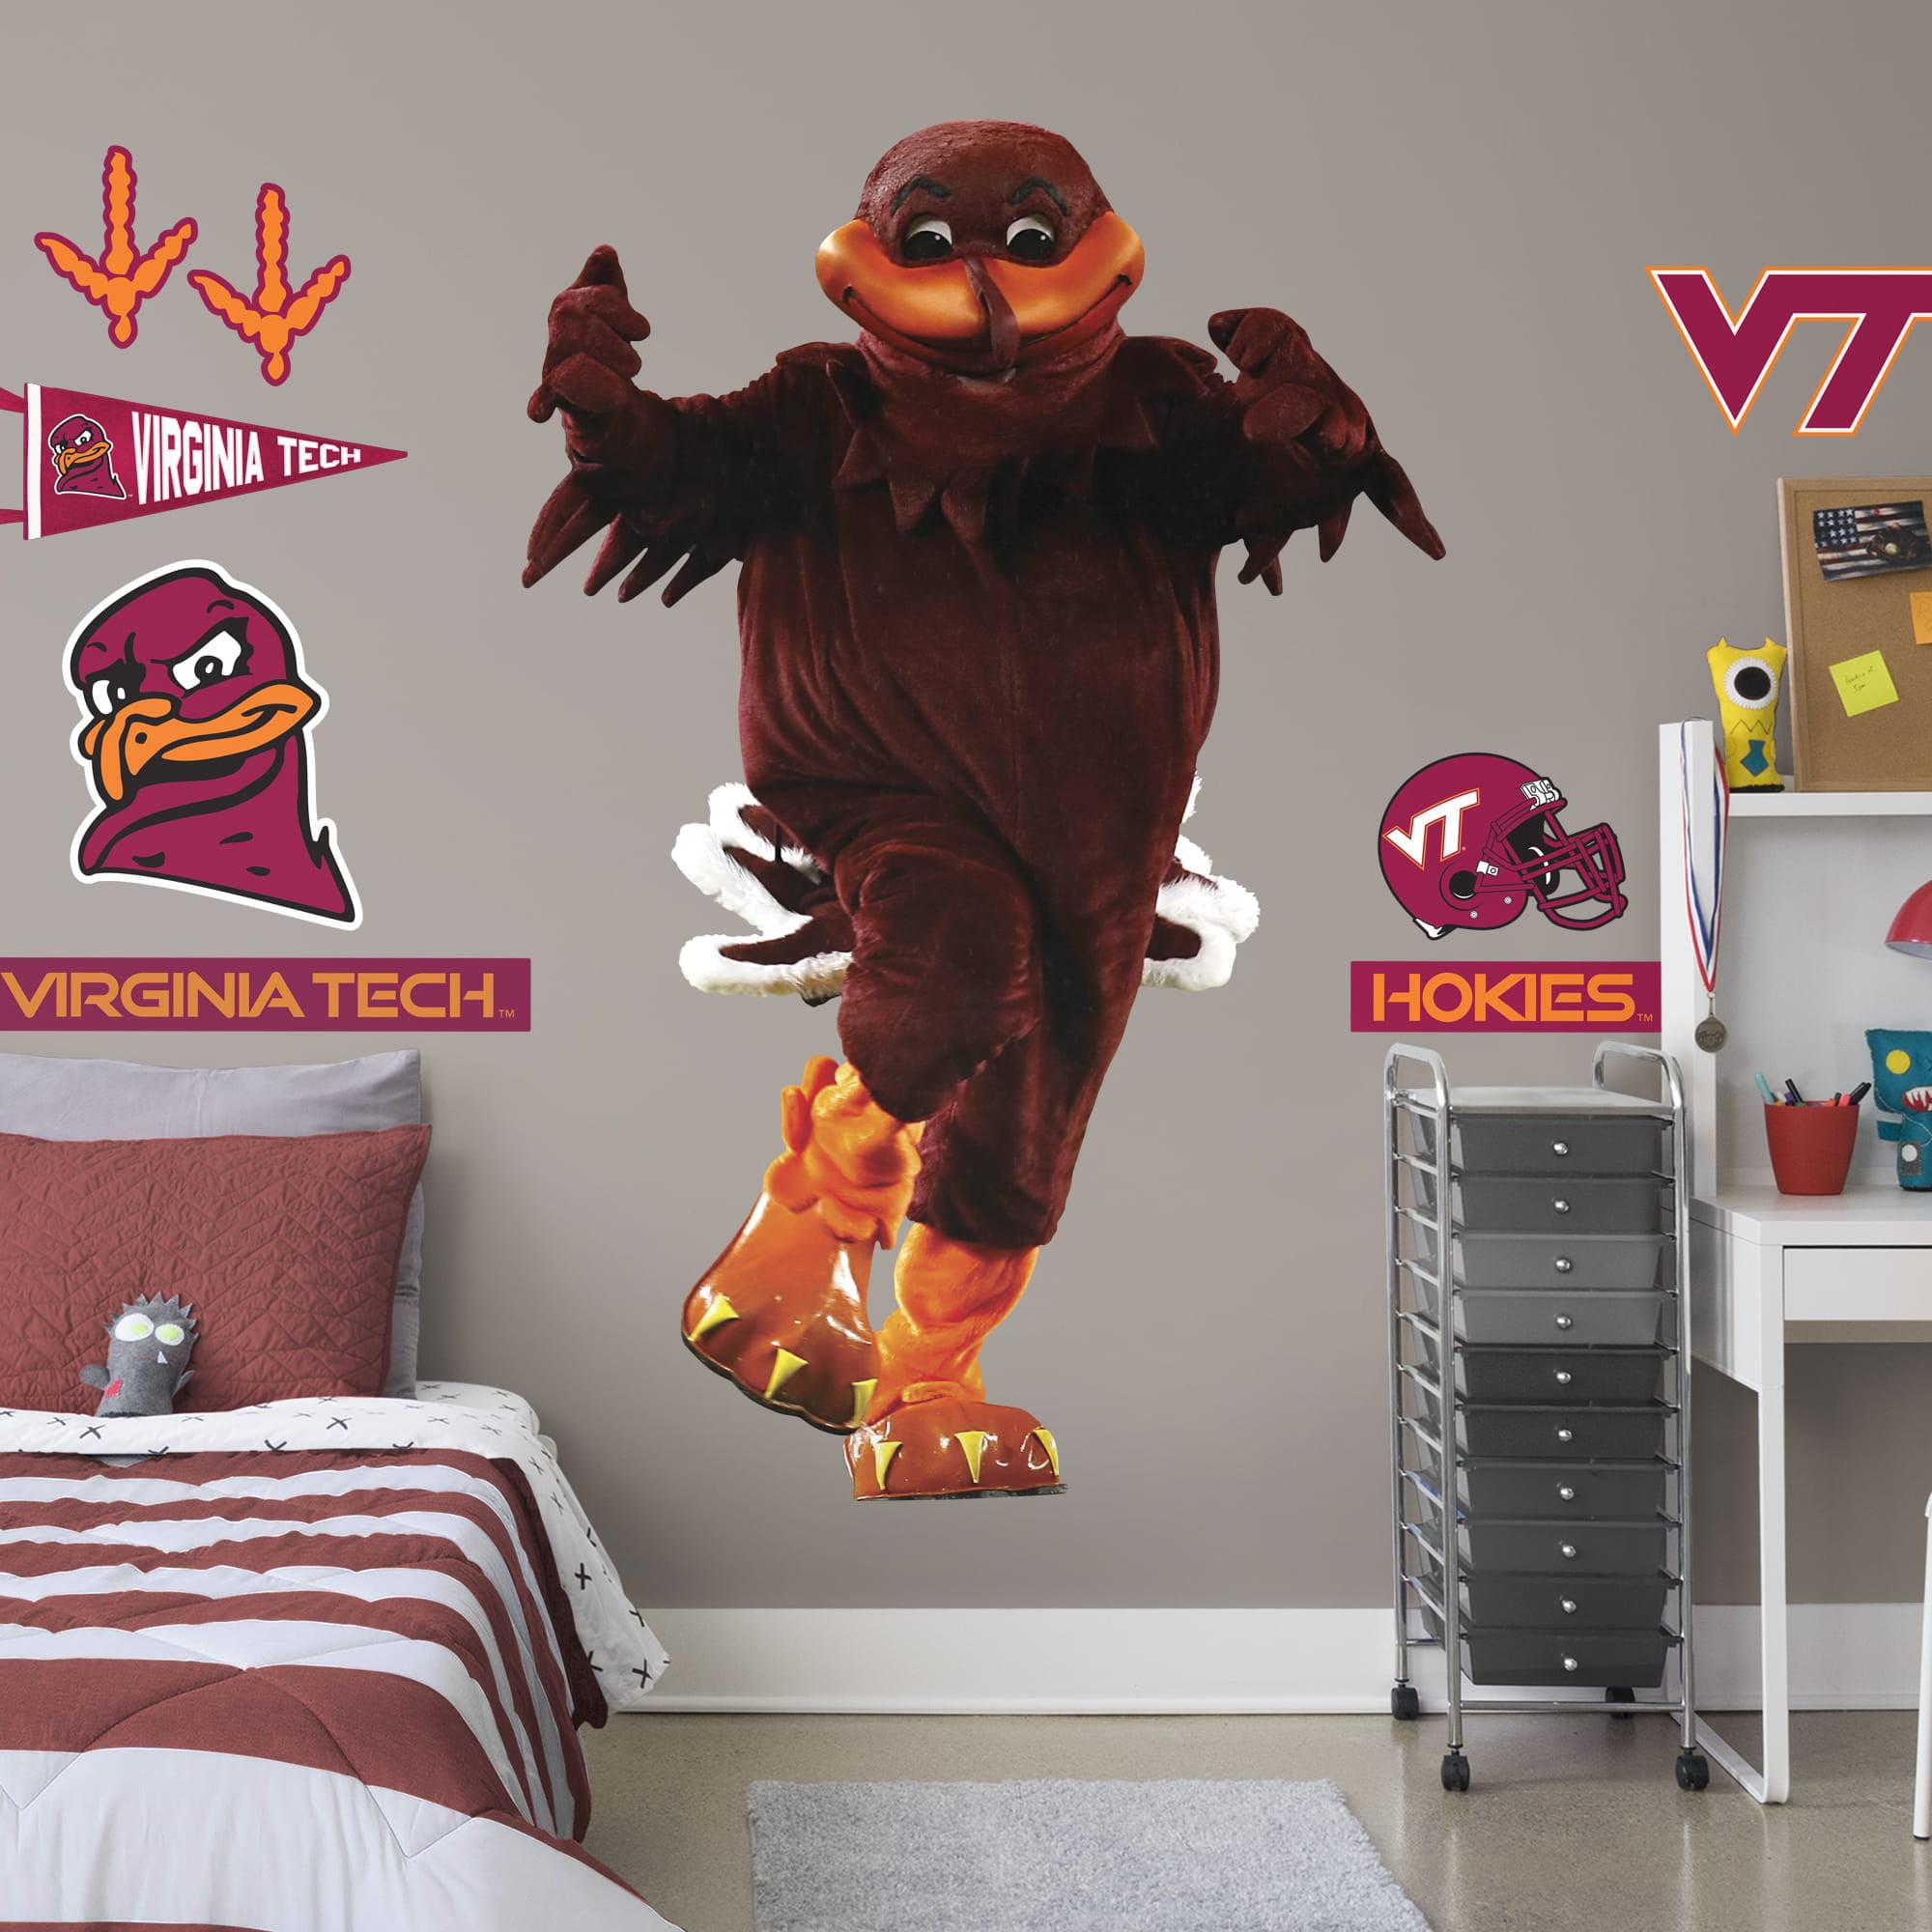 Fathead Virginia Tech Hokies: Hokiebird Mascot - Life-Size Officially Licensed Removable Wall ...